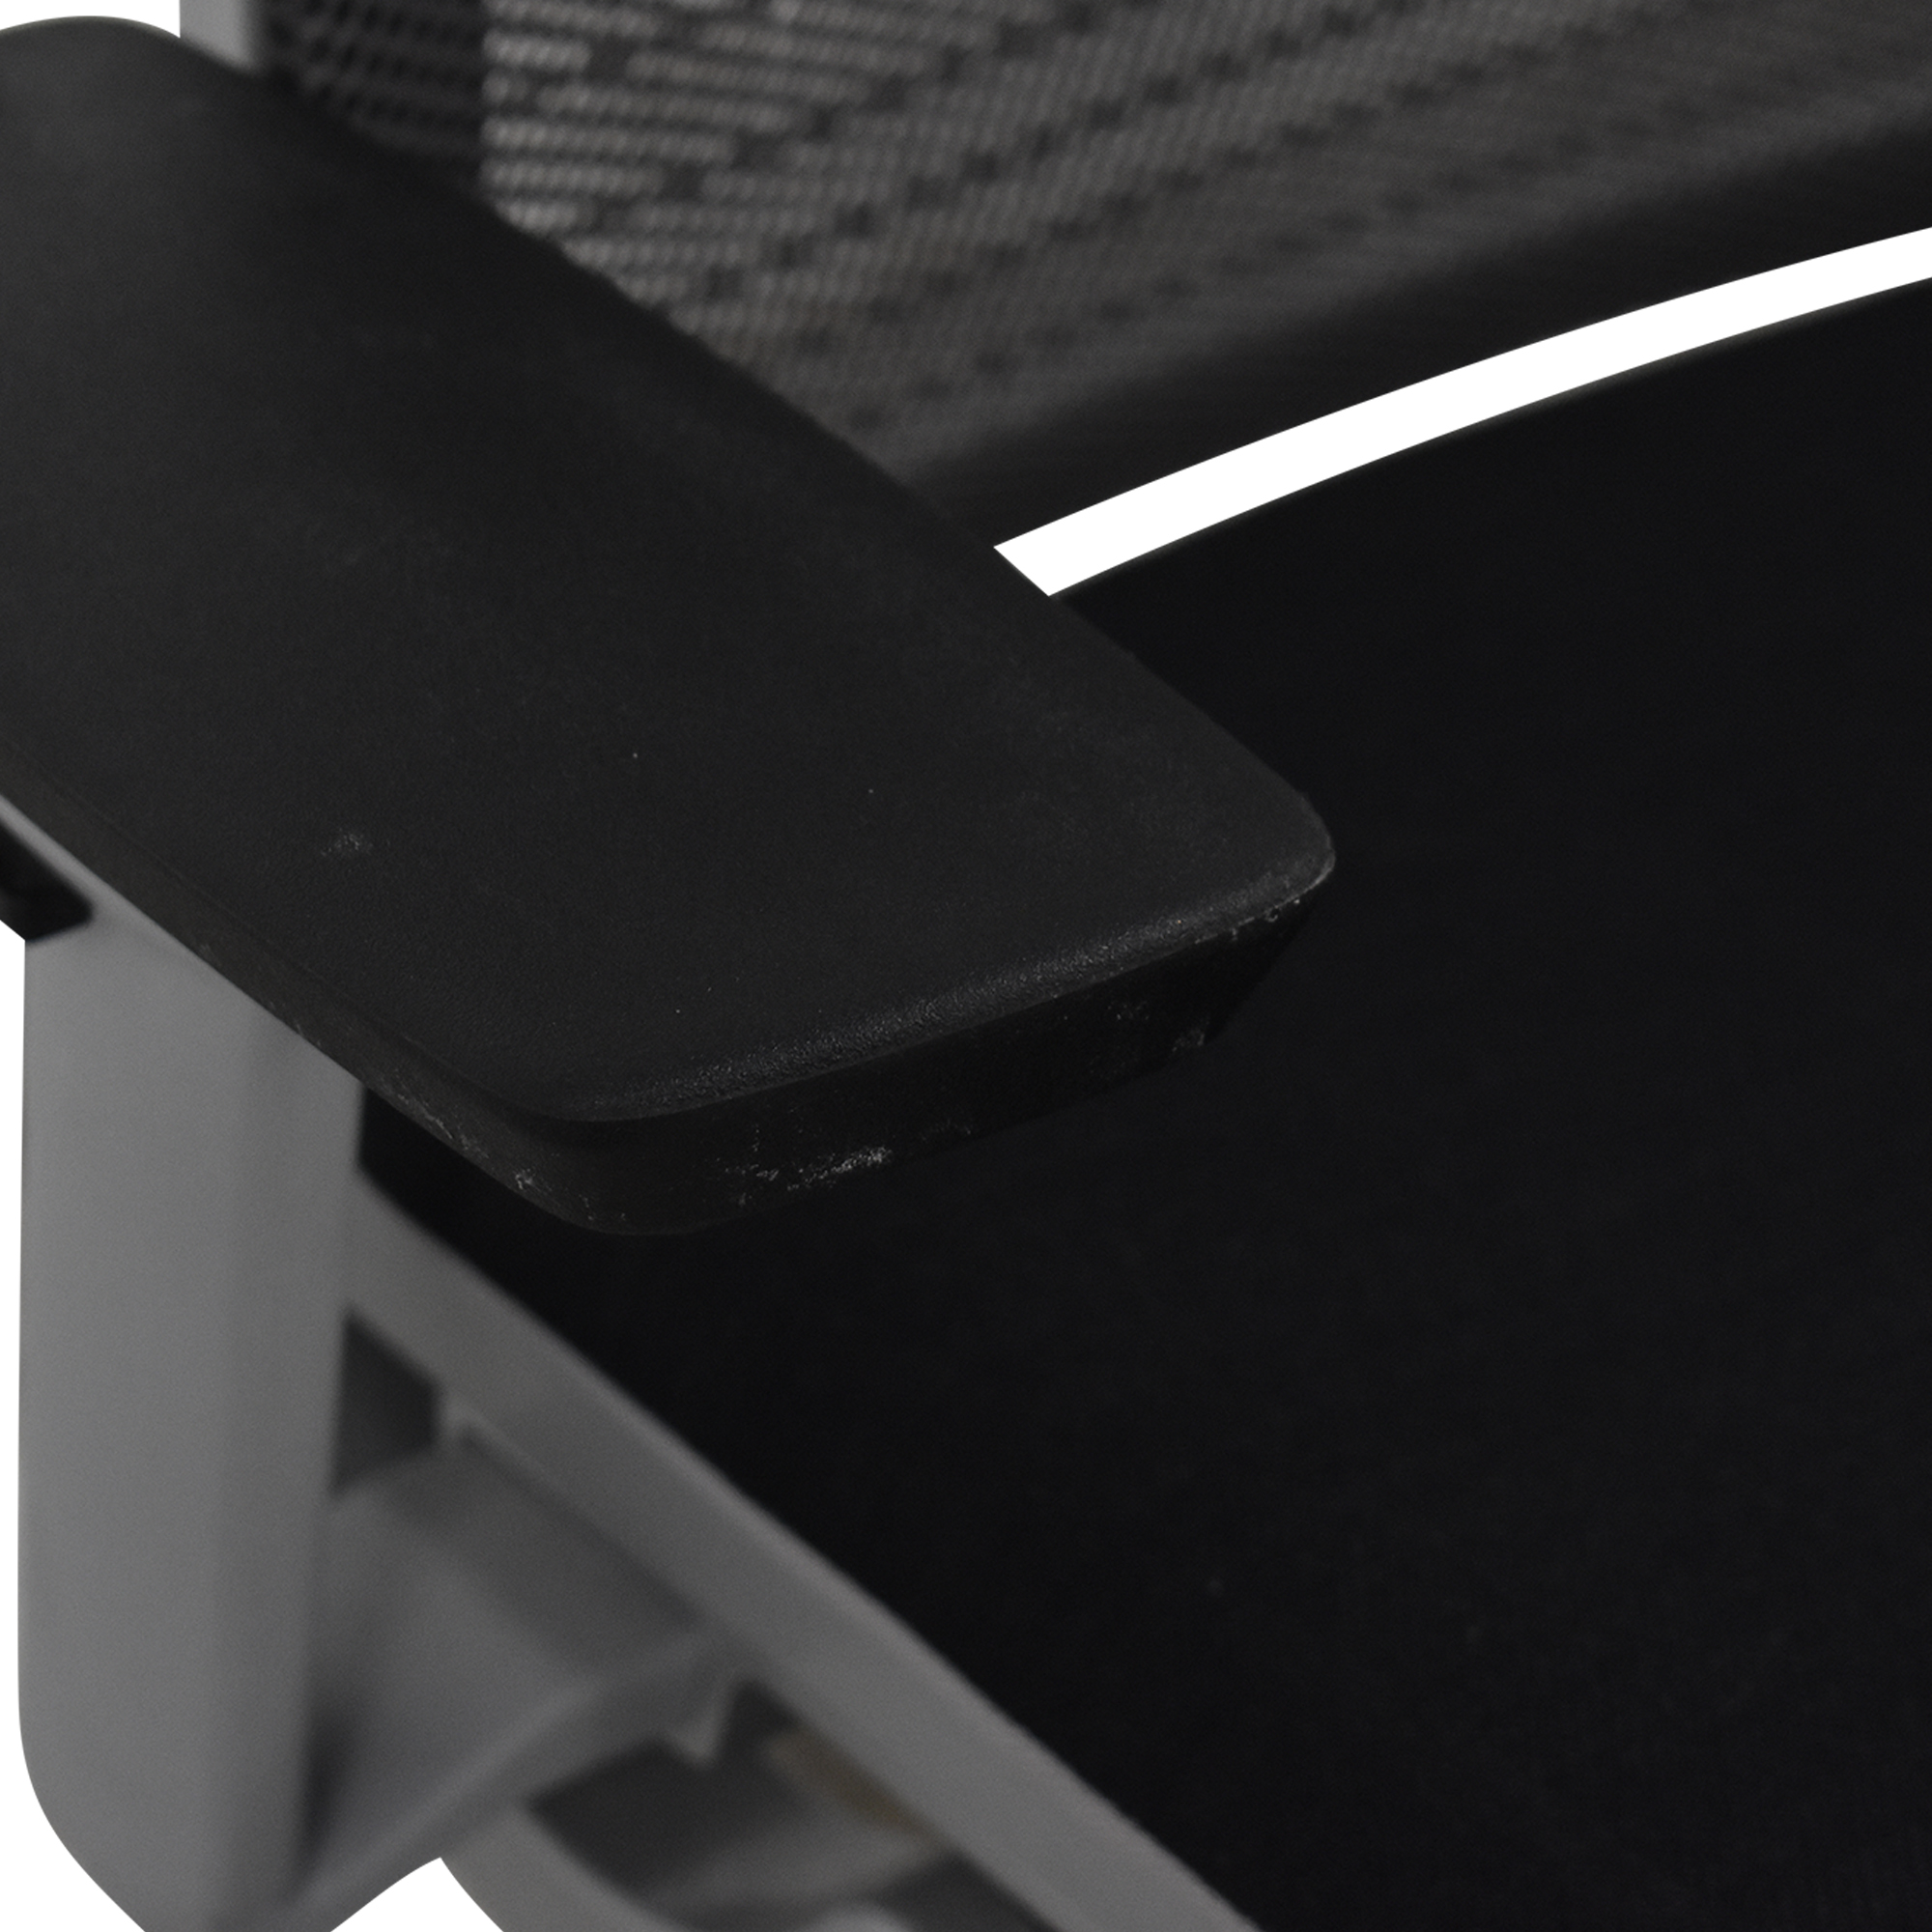 buy Steelcase Cobi Swivel Chair Steelcase